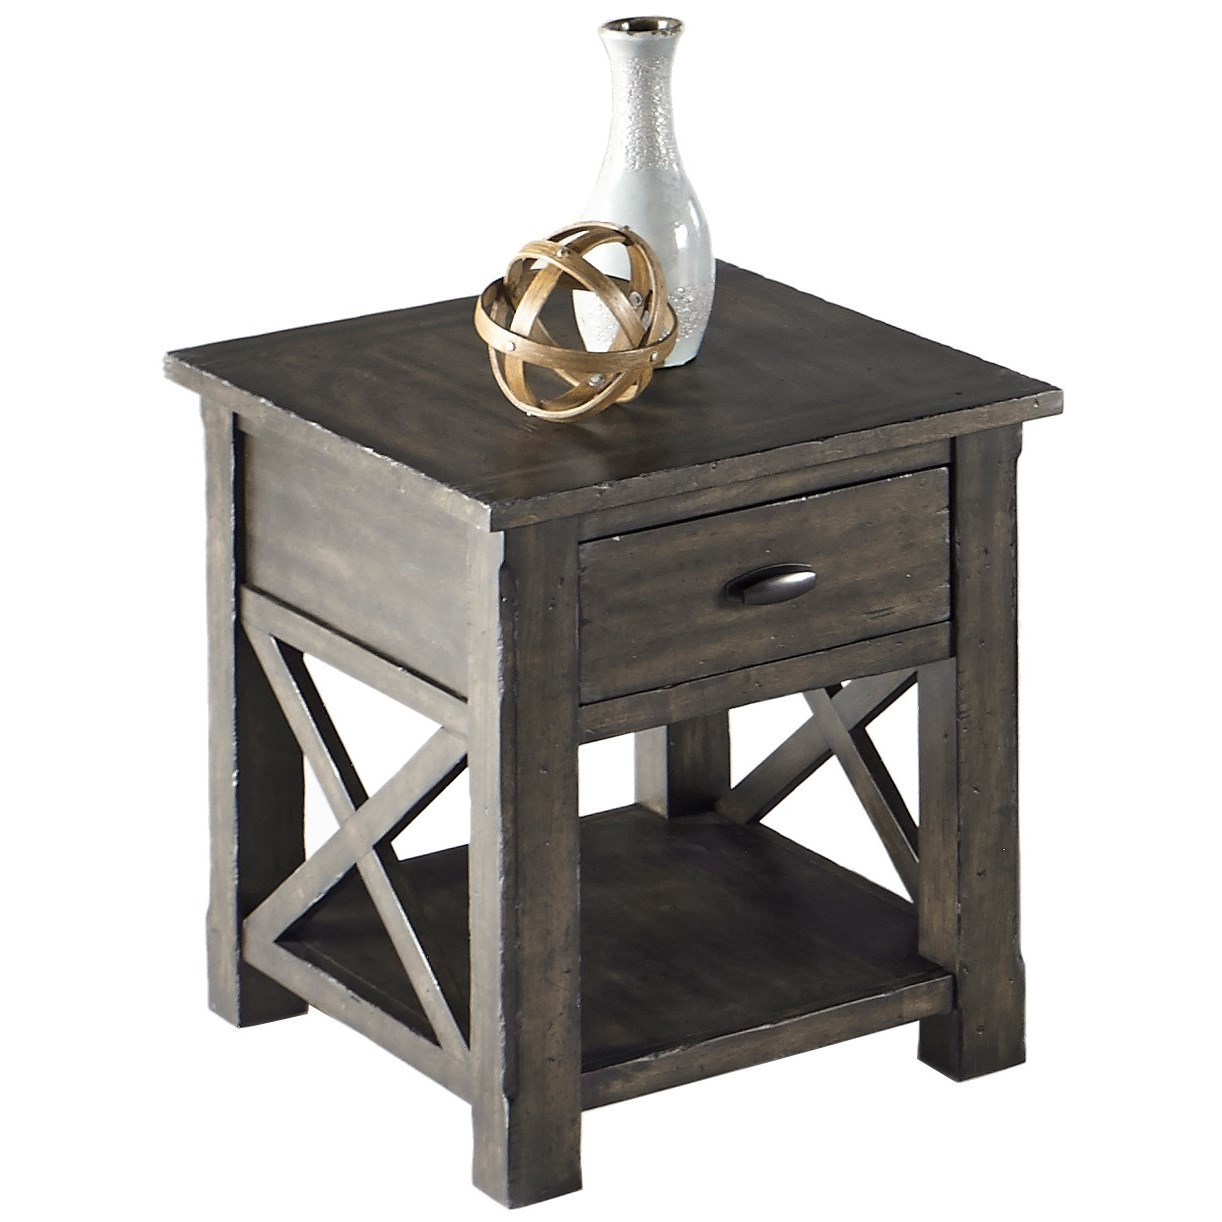 Progressive Furniture Crossroads Rectangular End Table - Item Number: T550-04